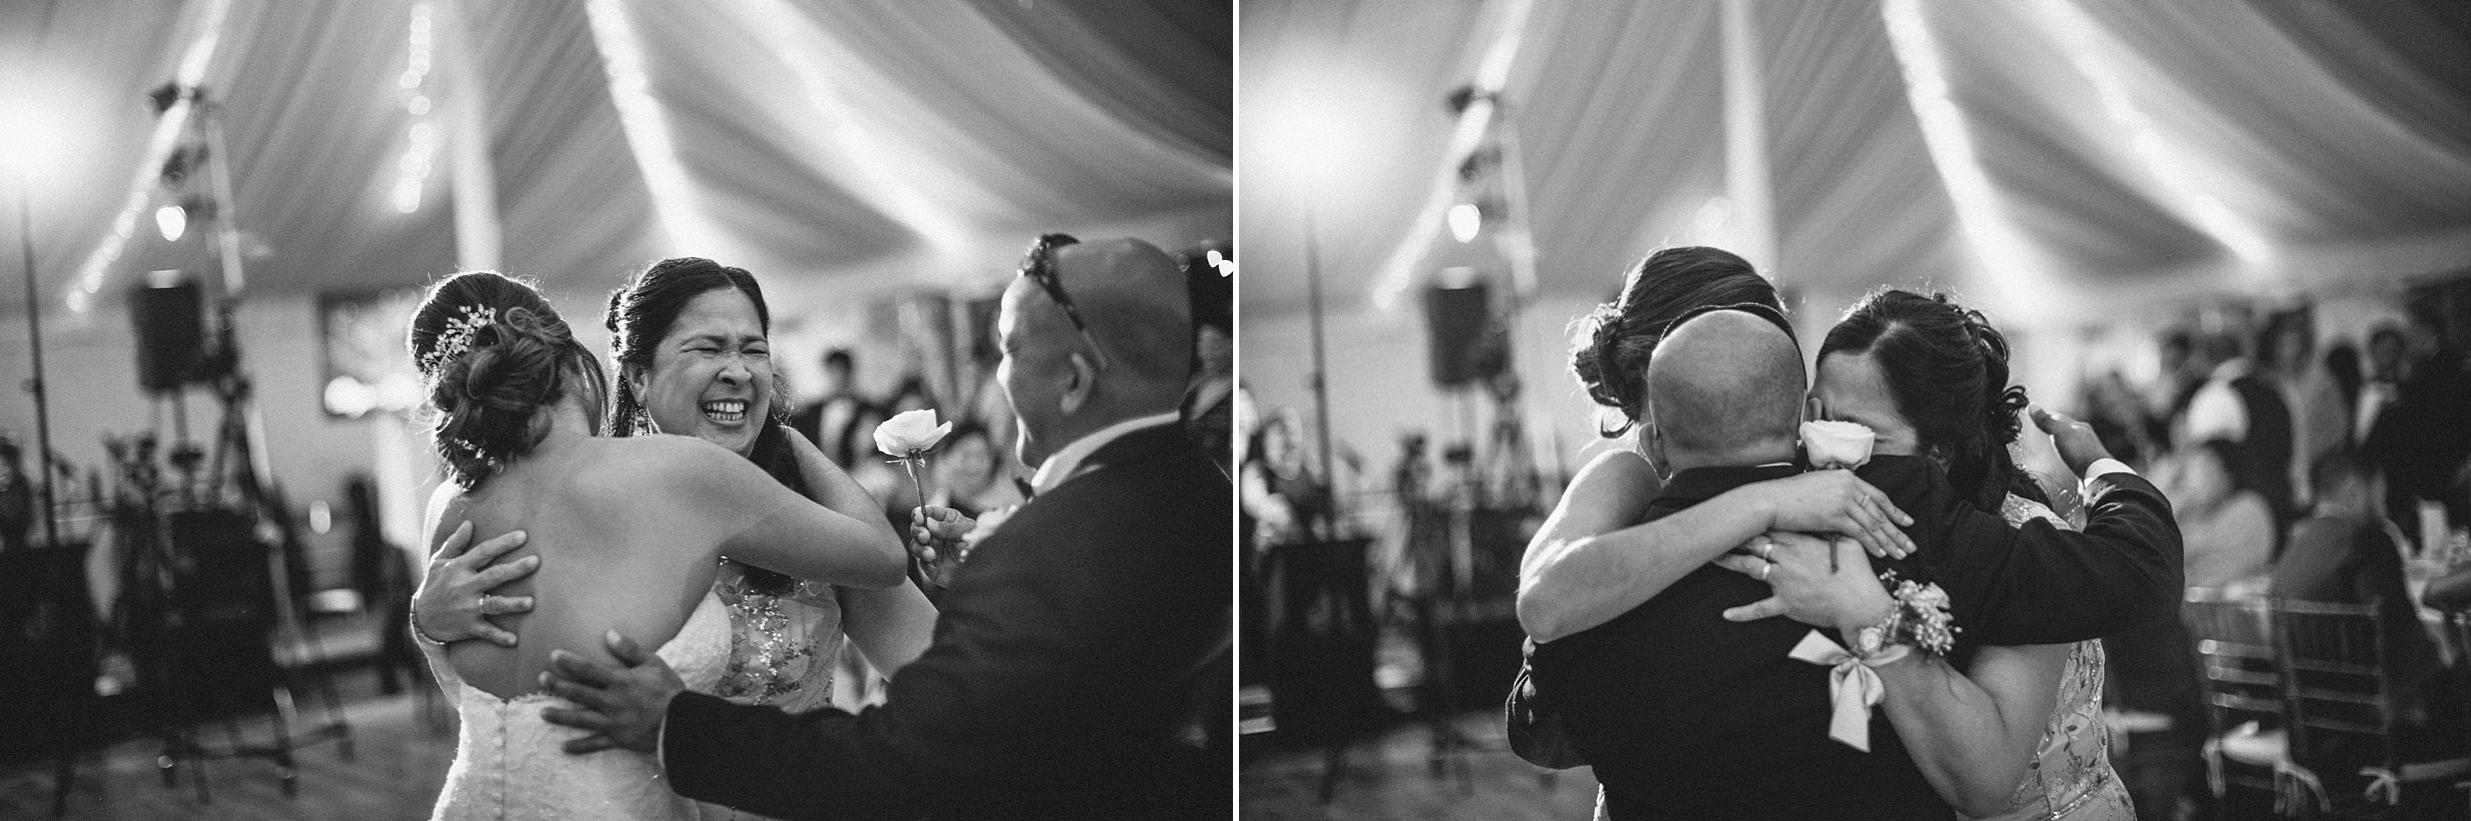 crossed-keys-estate-filipino-wedding-nj_0123.jpg